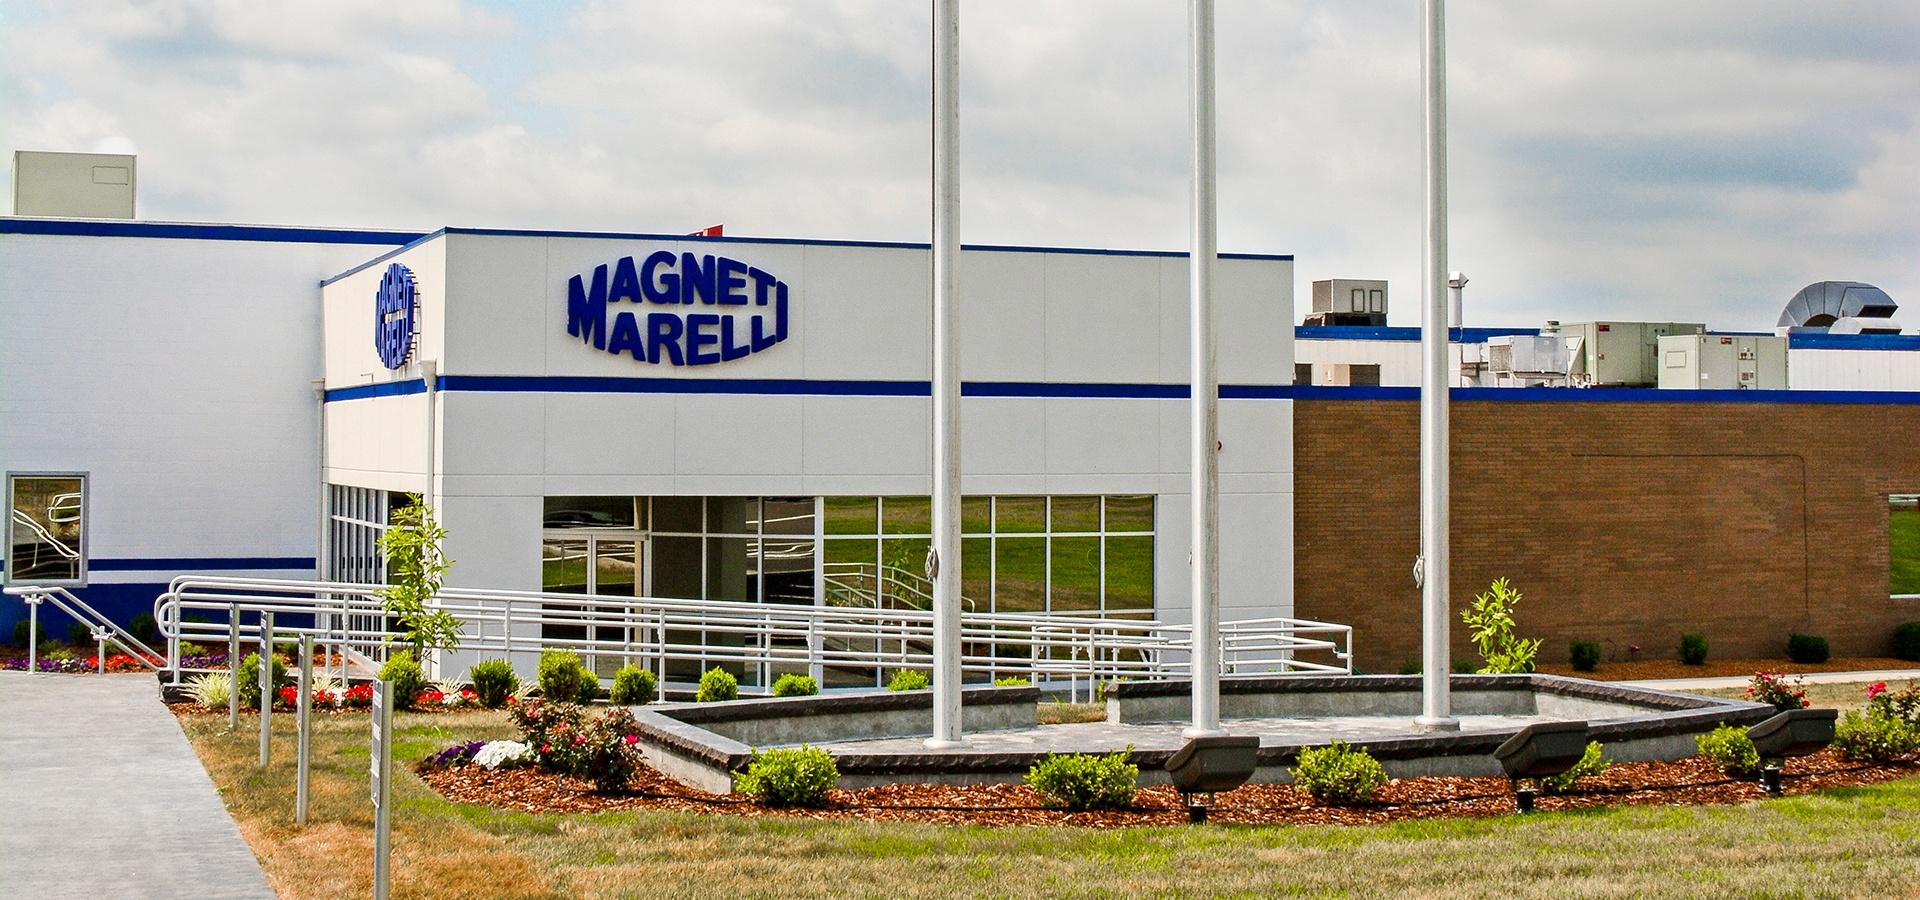 Magneti Marelli | Pulaski, Tennessee | Brindley Construction